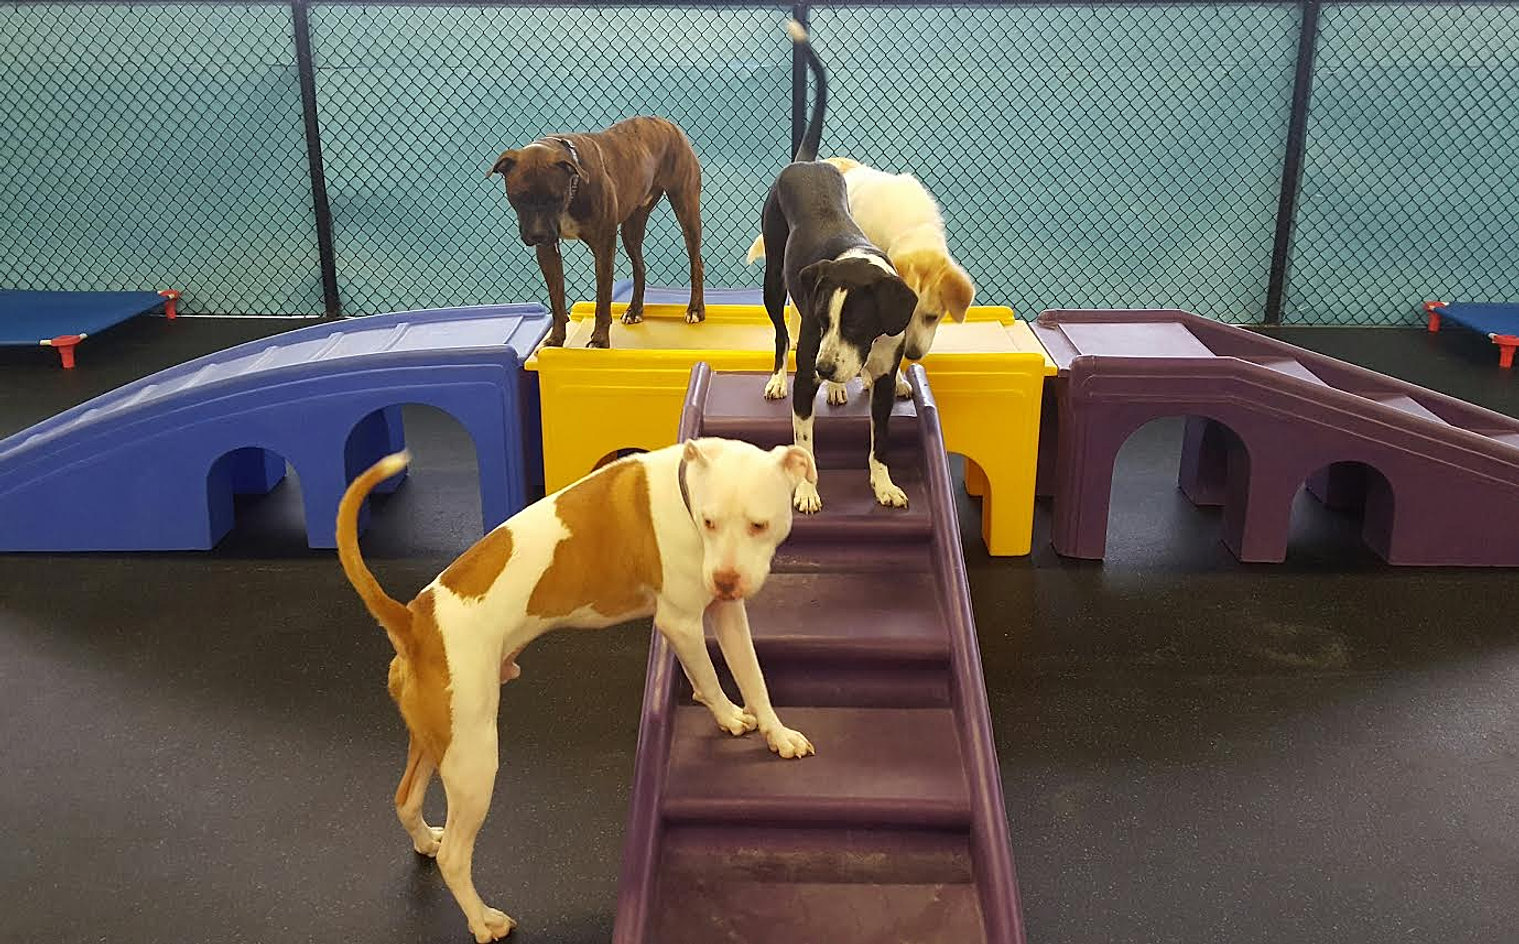 Dog daycare the colony dog daycare frisco dog daycare plano turco gozer tux on bridge solutioingenieria Image collections